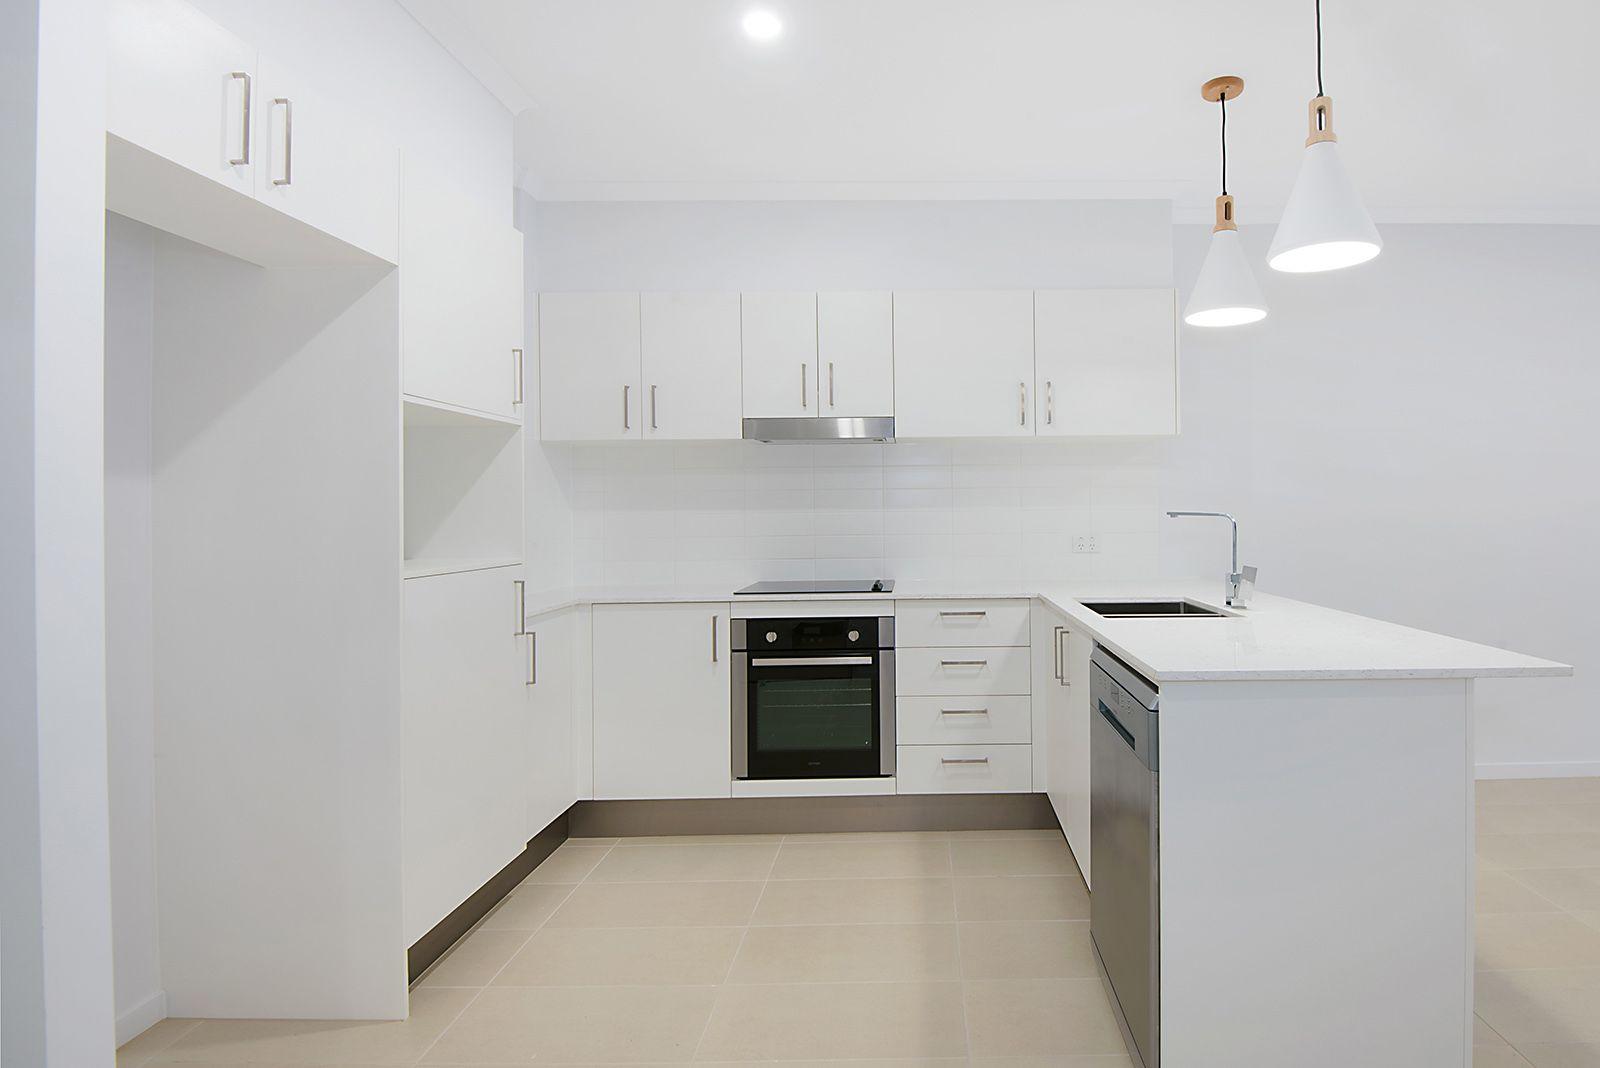 205/5-9 FOLKESTONE STREET, Bowen Hills QLD 4006, Image 1